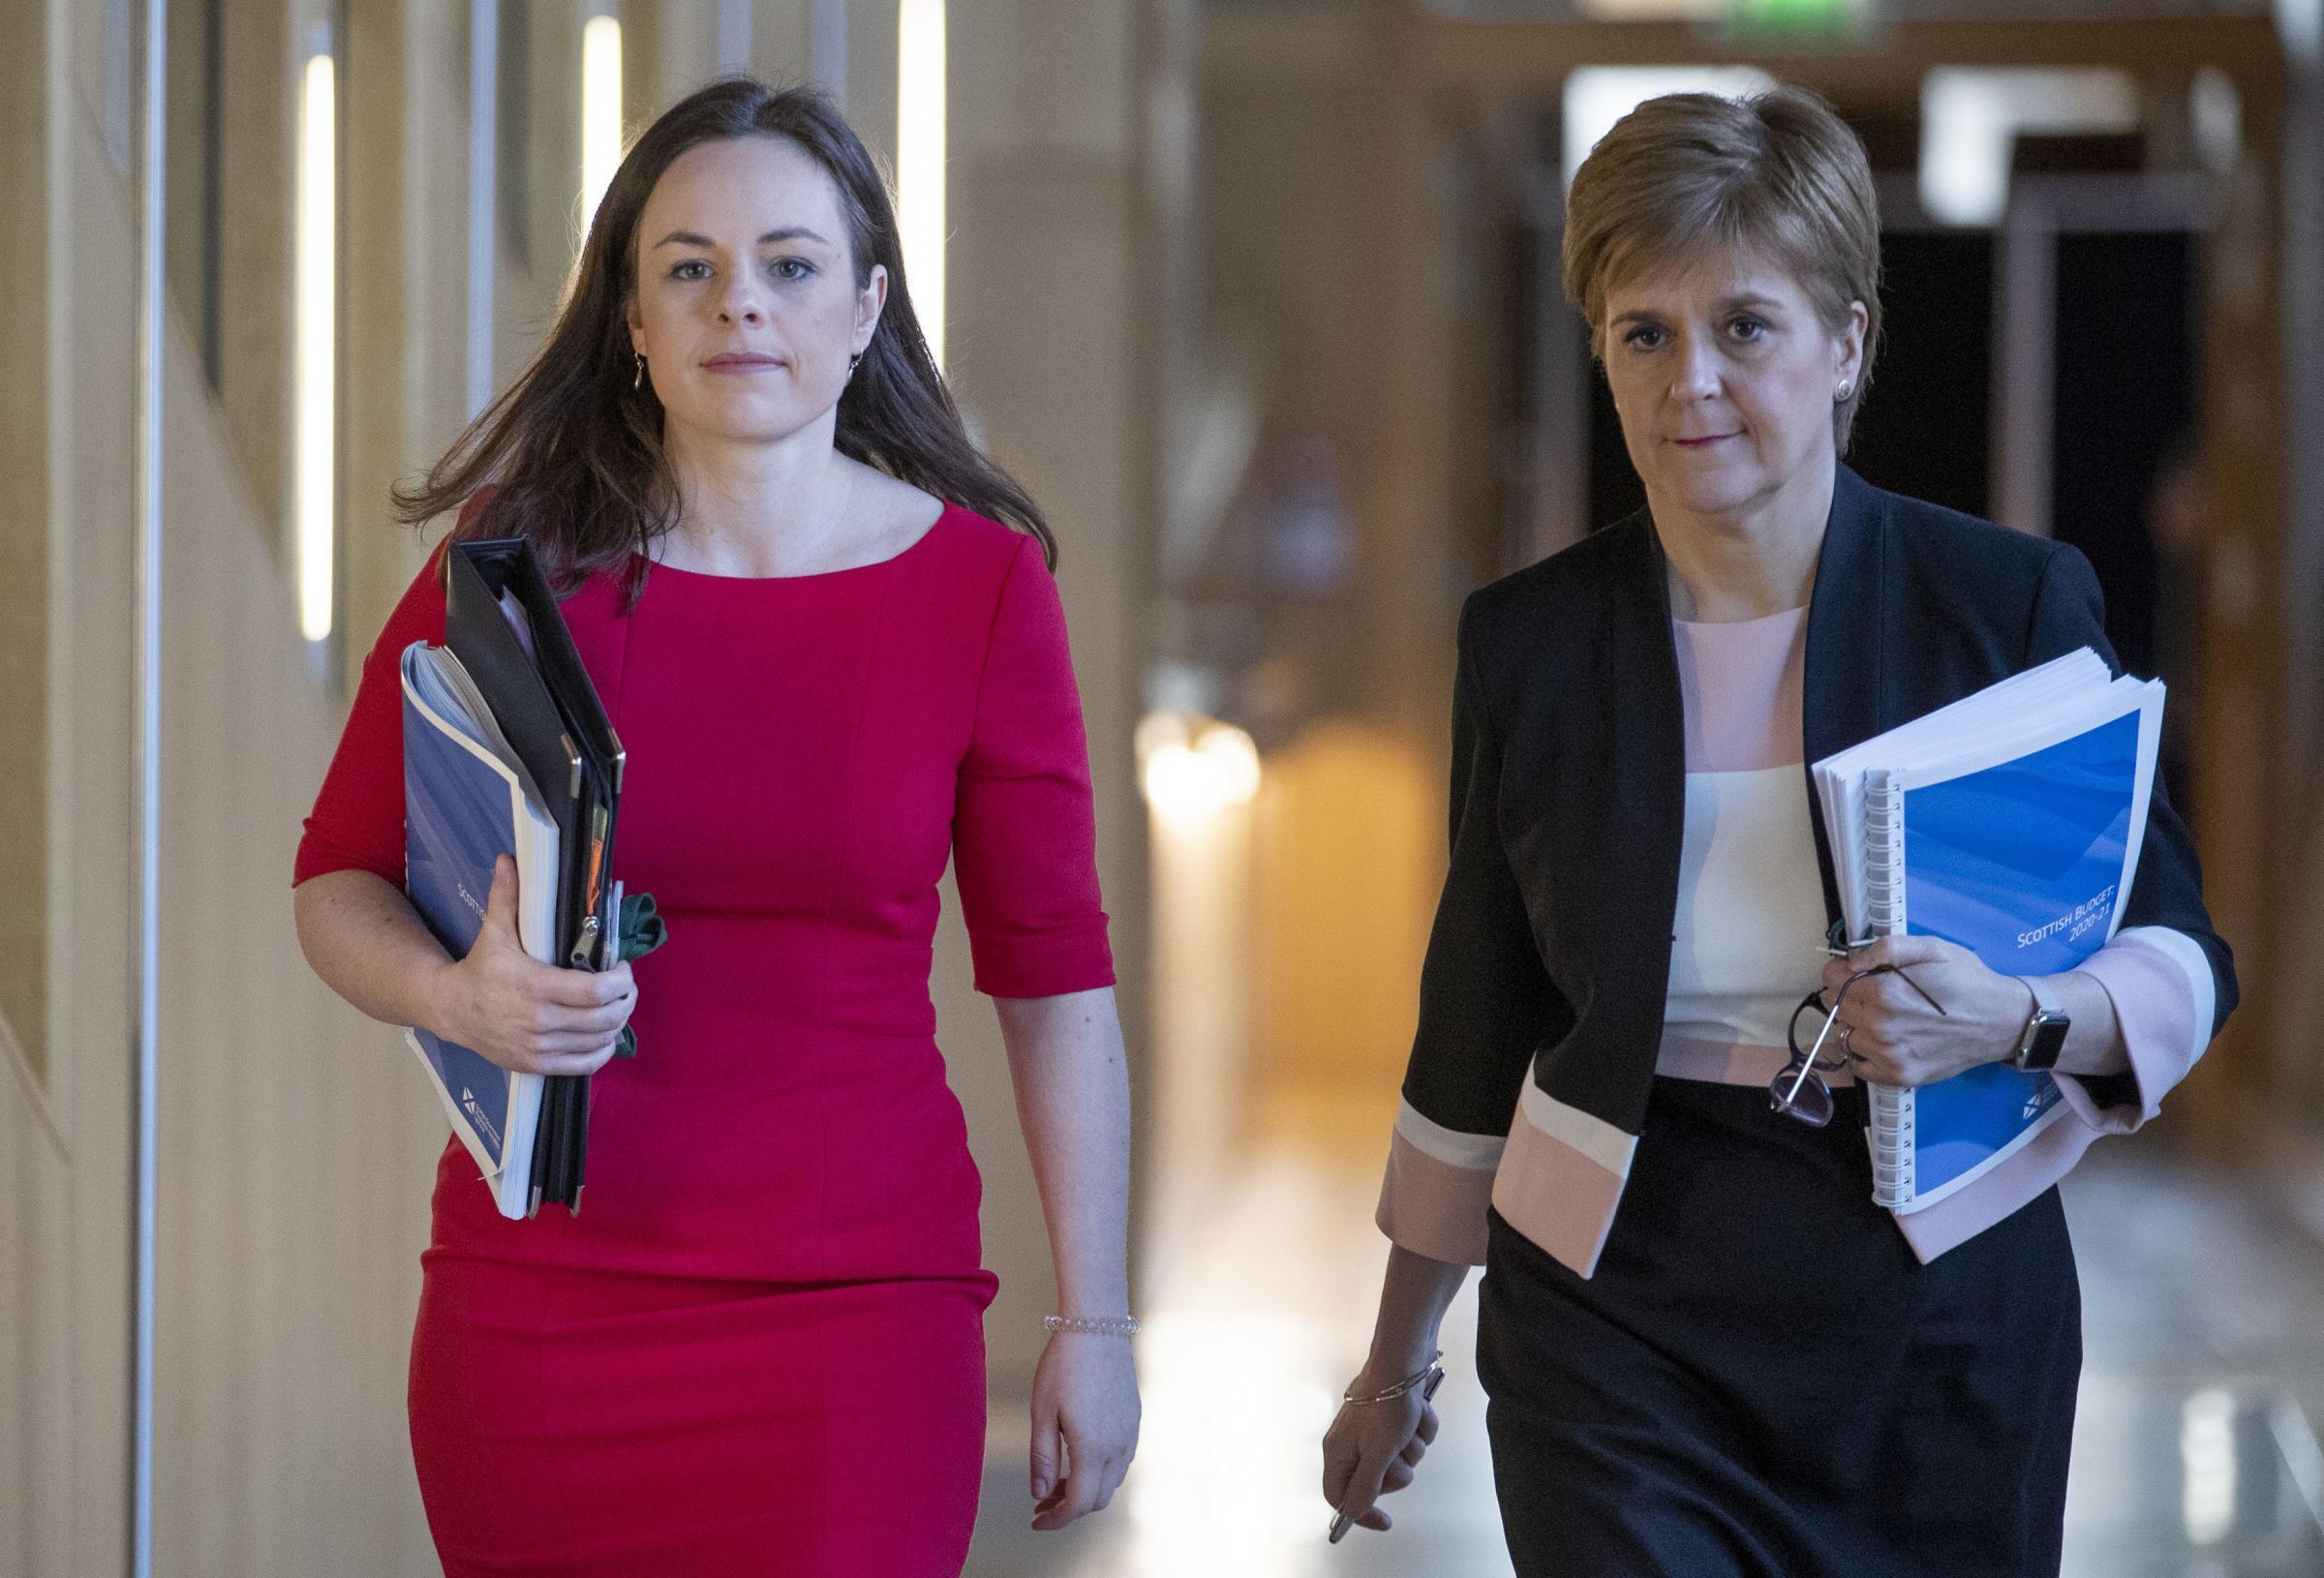 Nicola Sturgeon: We have strong investment to meet net zero challenge